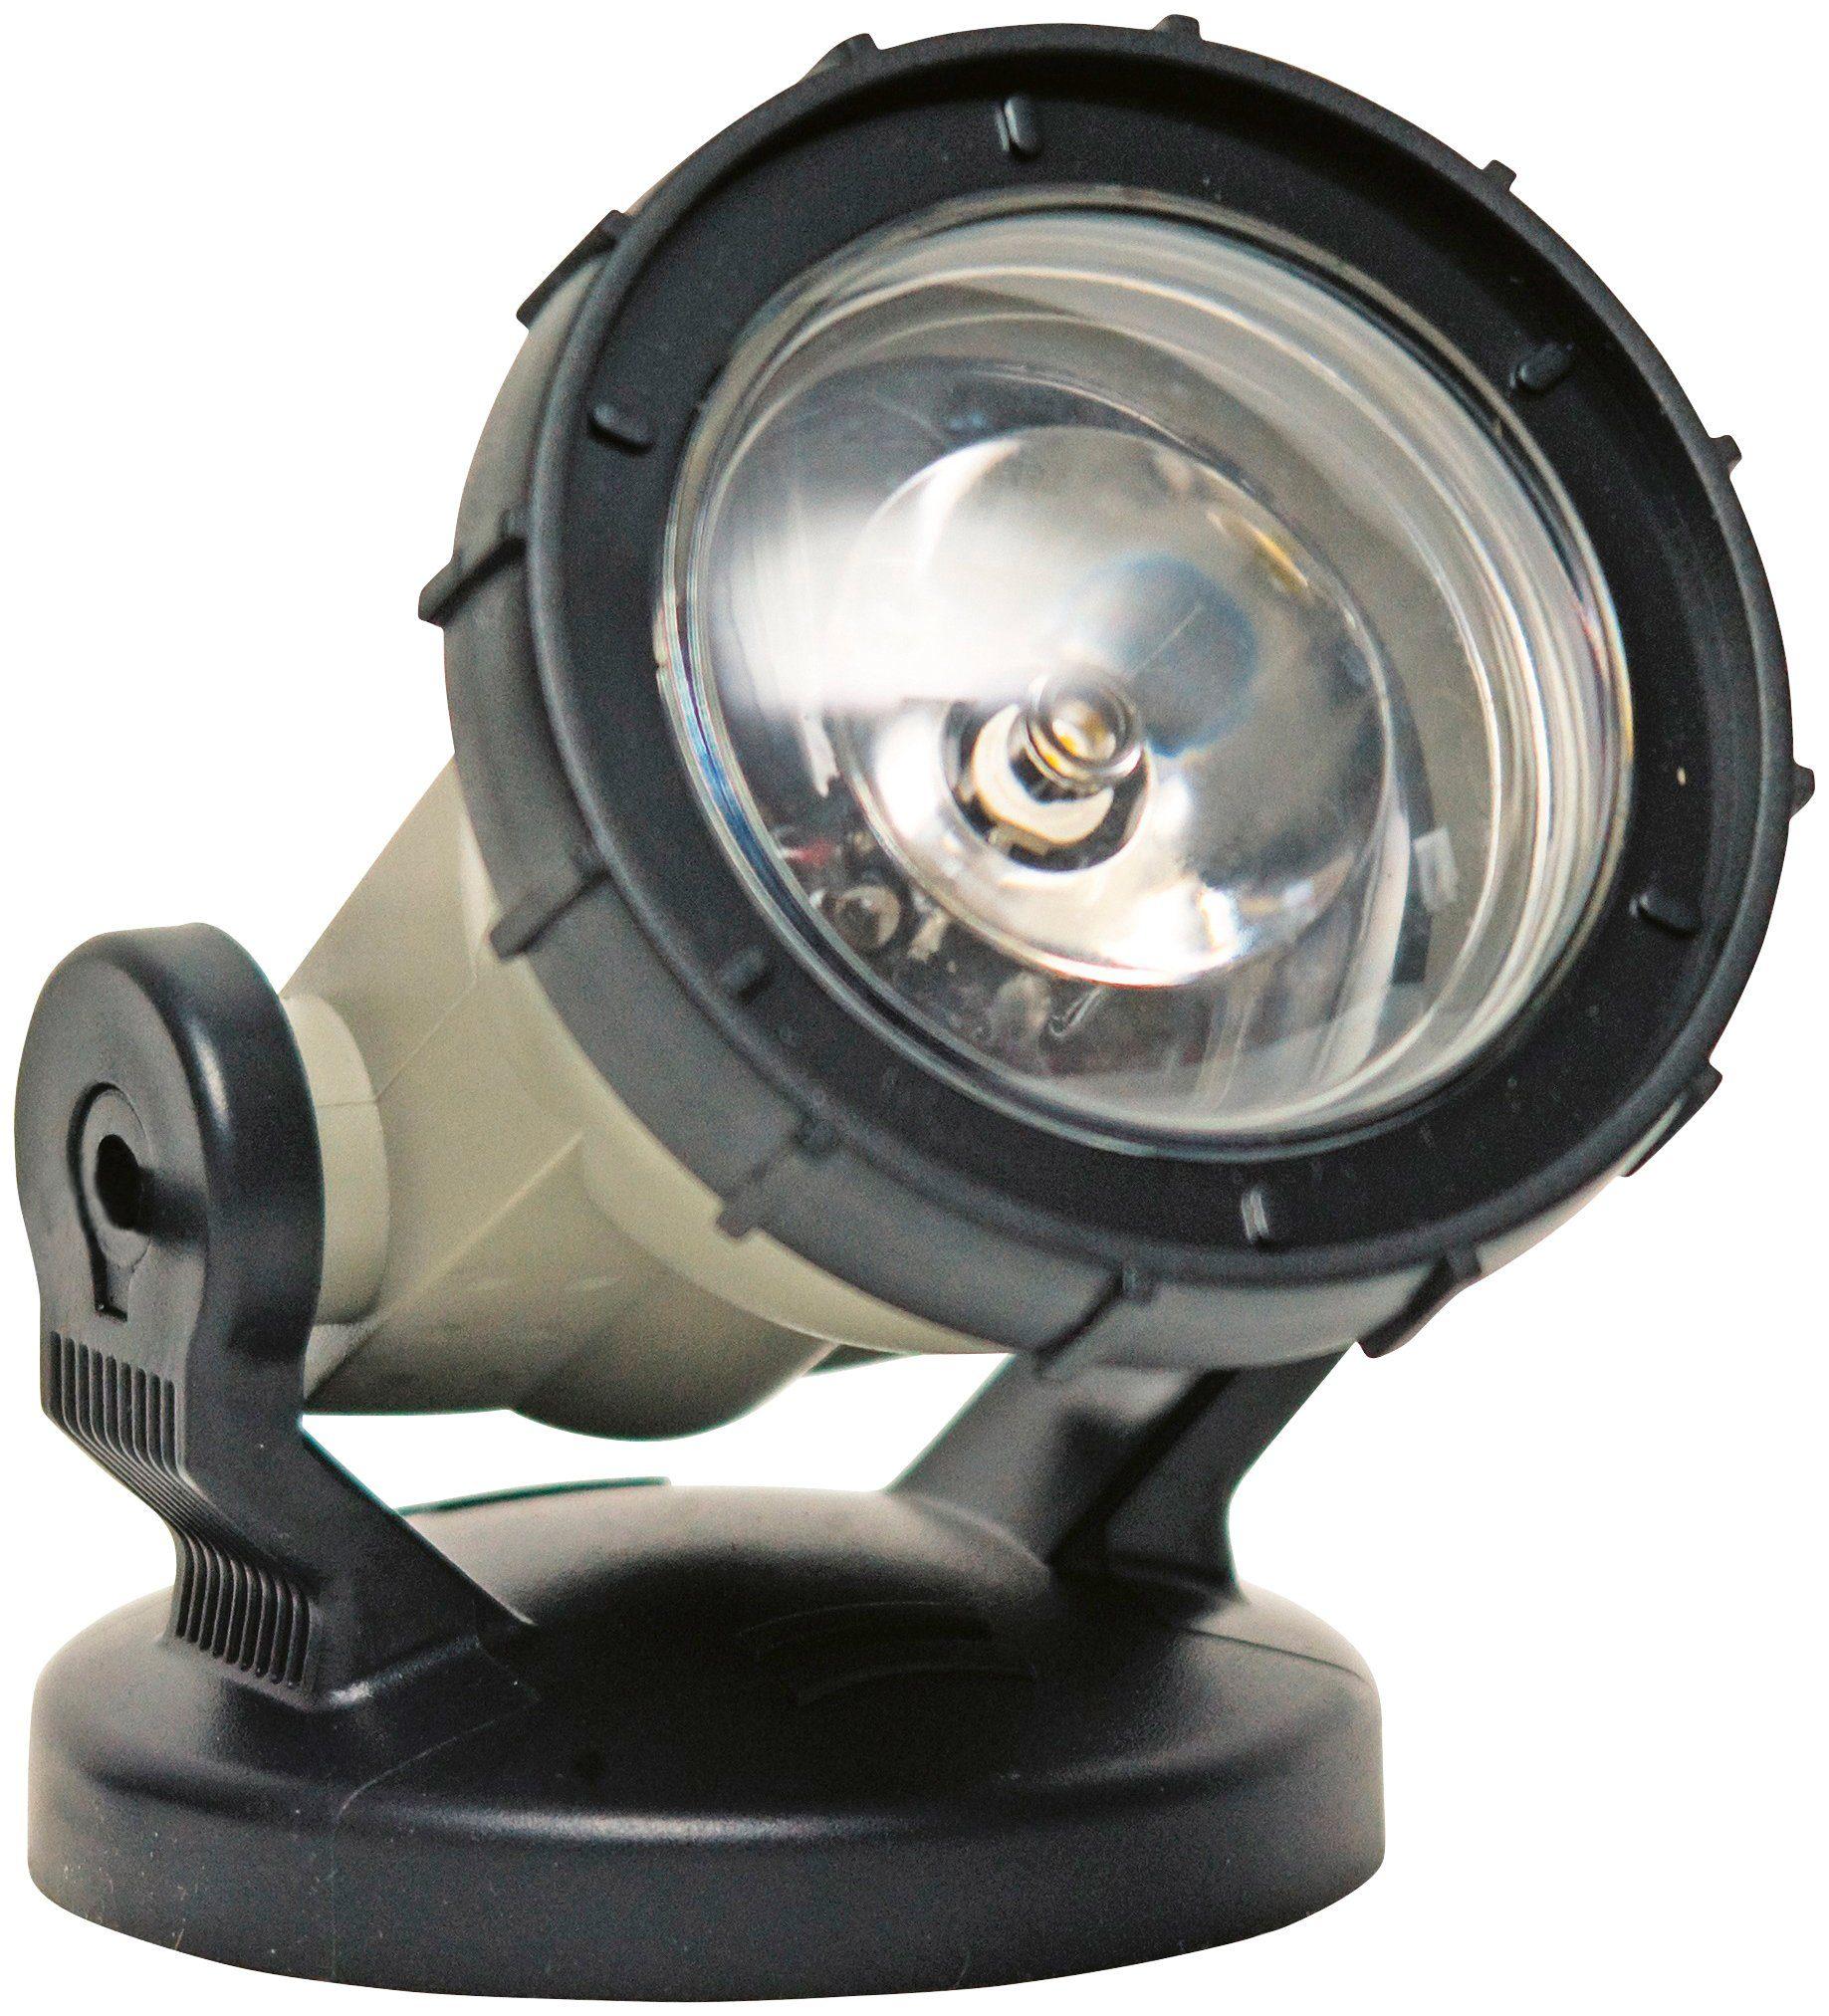 HEISSNER LED-Strahler »U401 High Power«, 3 Watt, mit Erdspieß